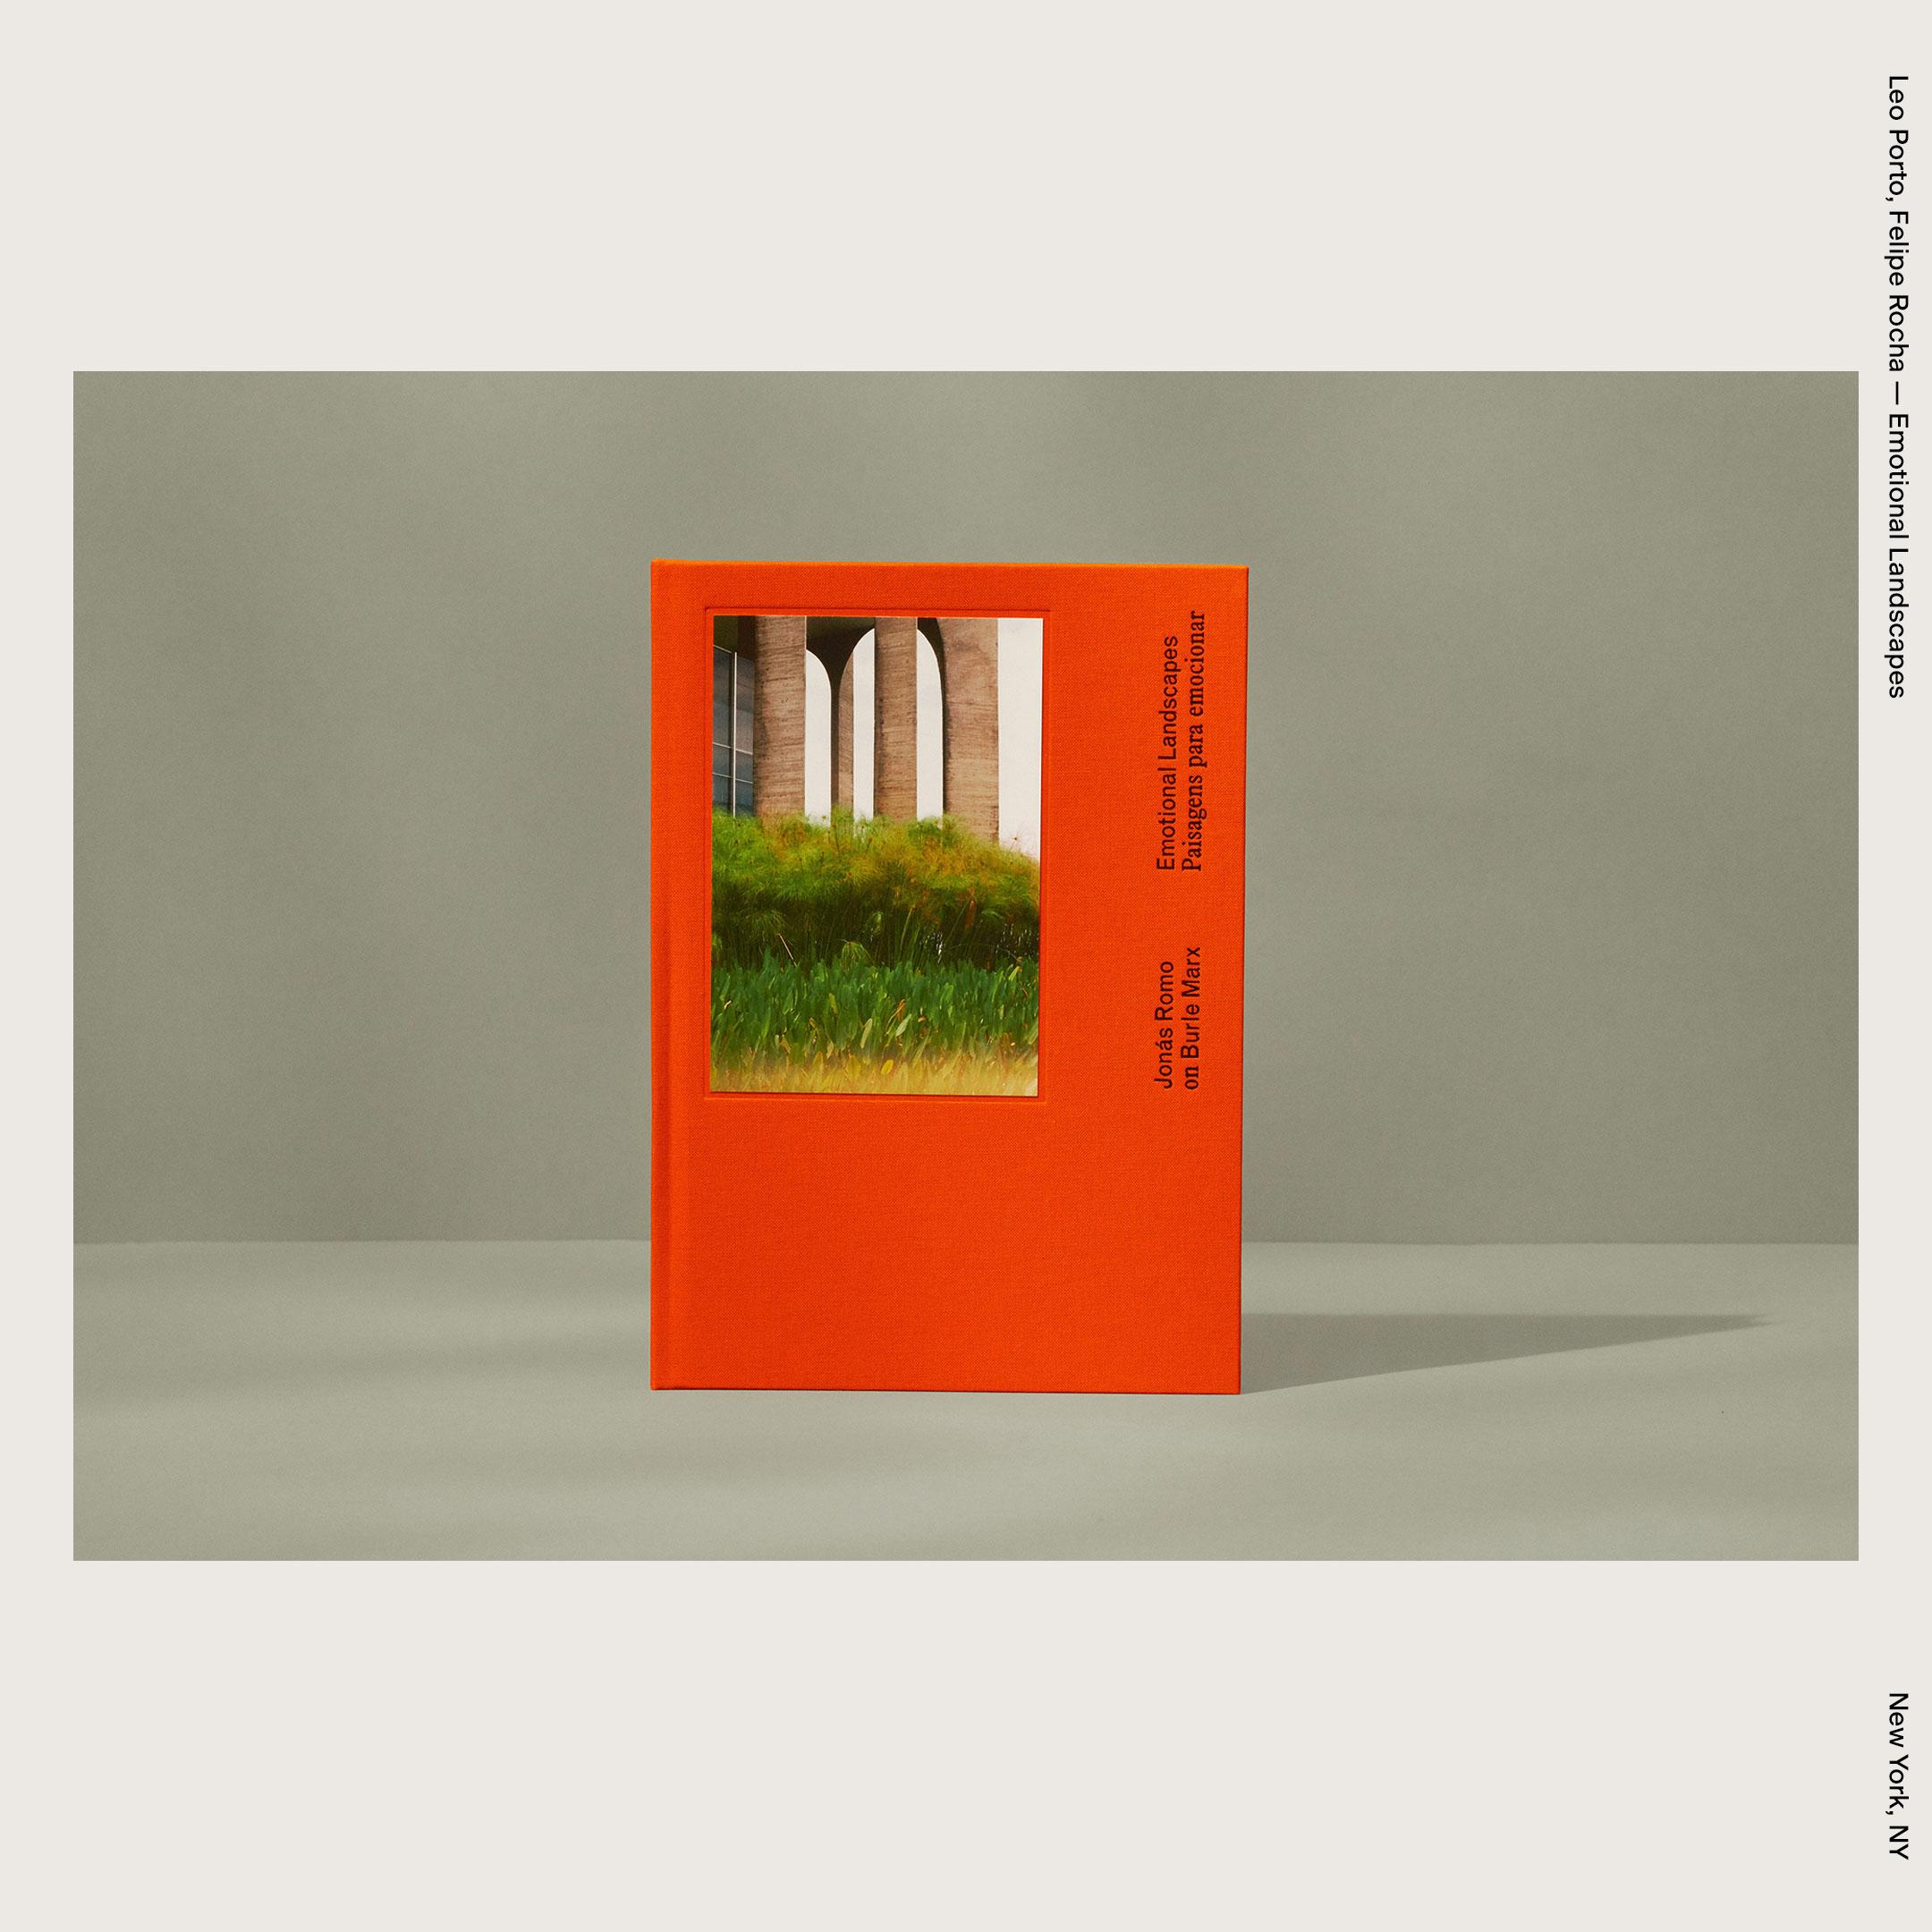 Leo Porto, Felipe Rocha — Emotional Landscapes